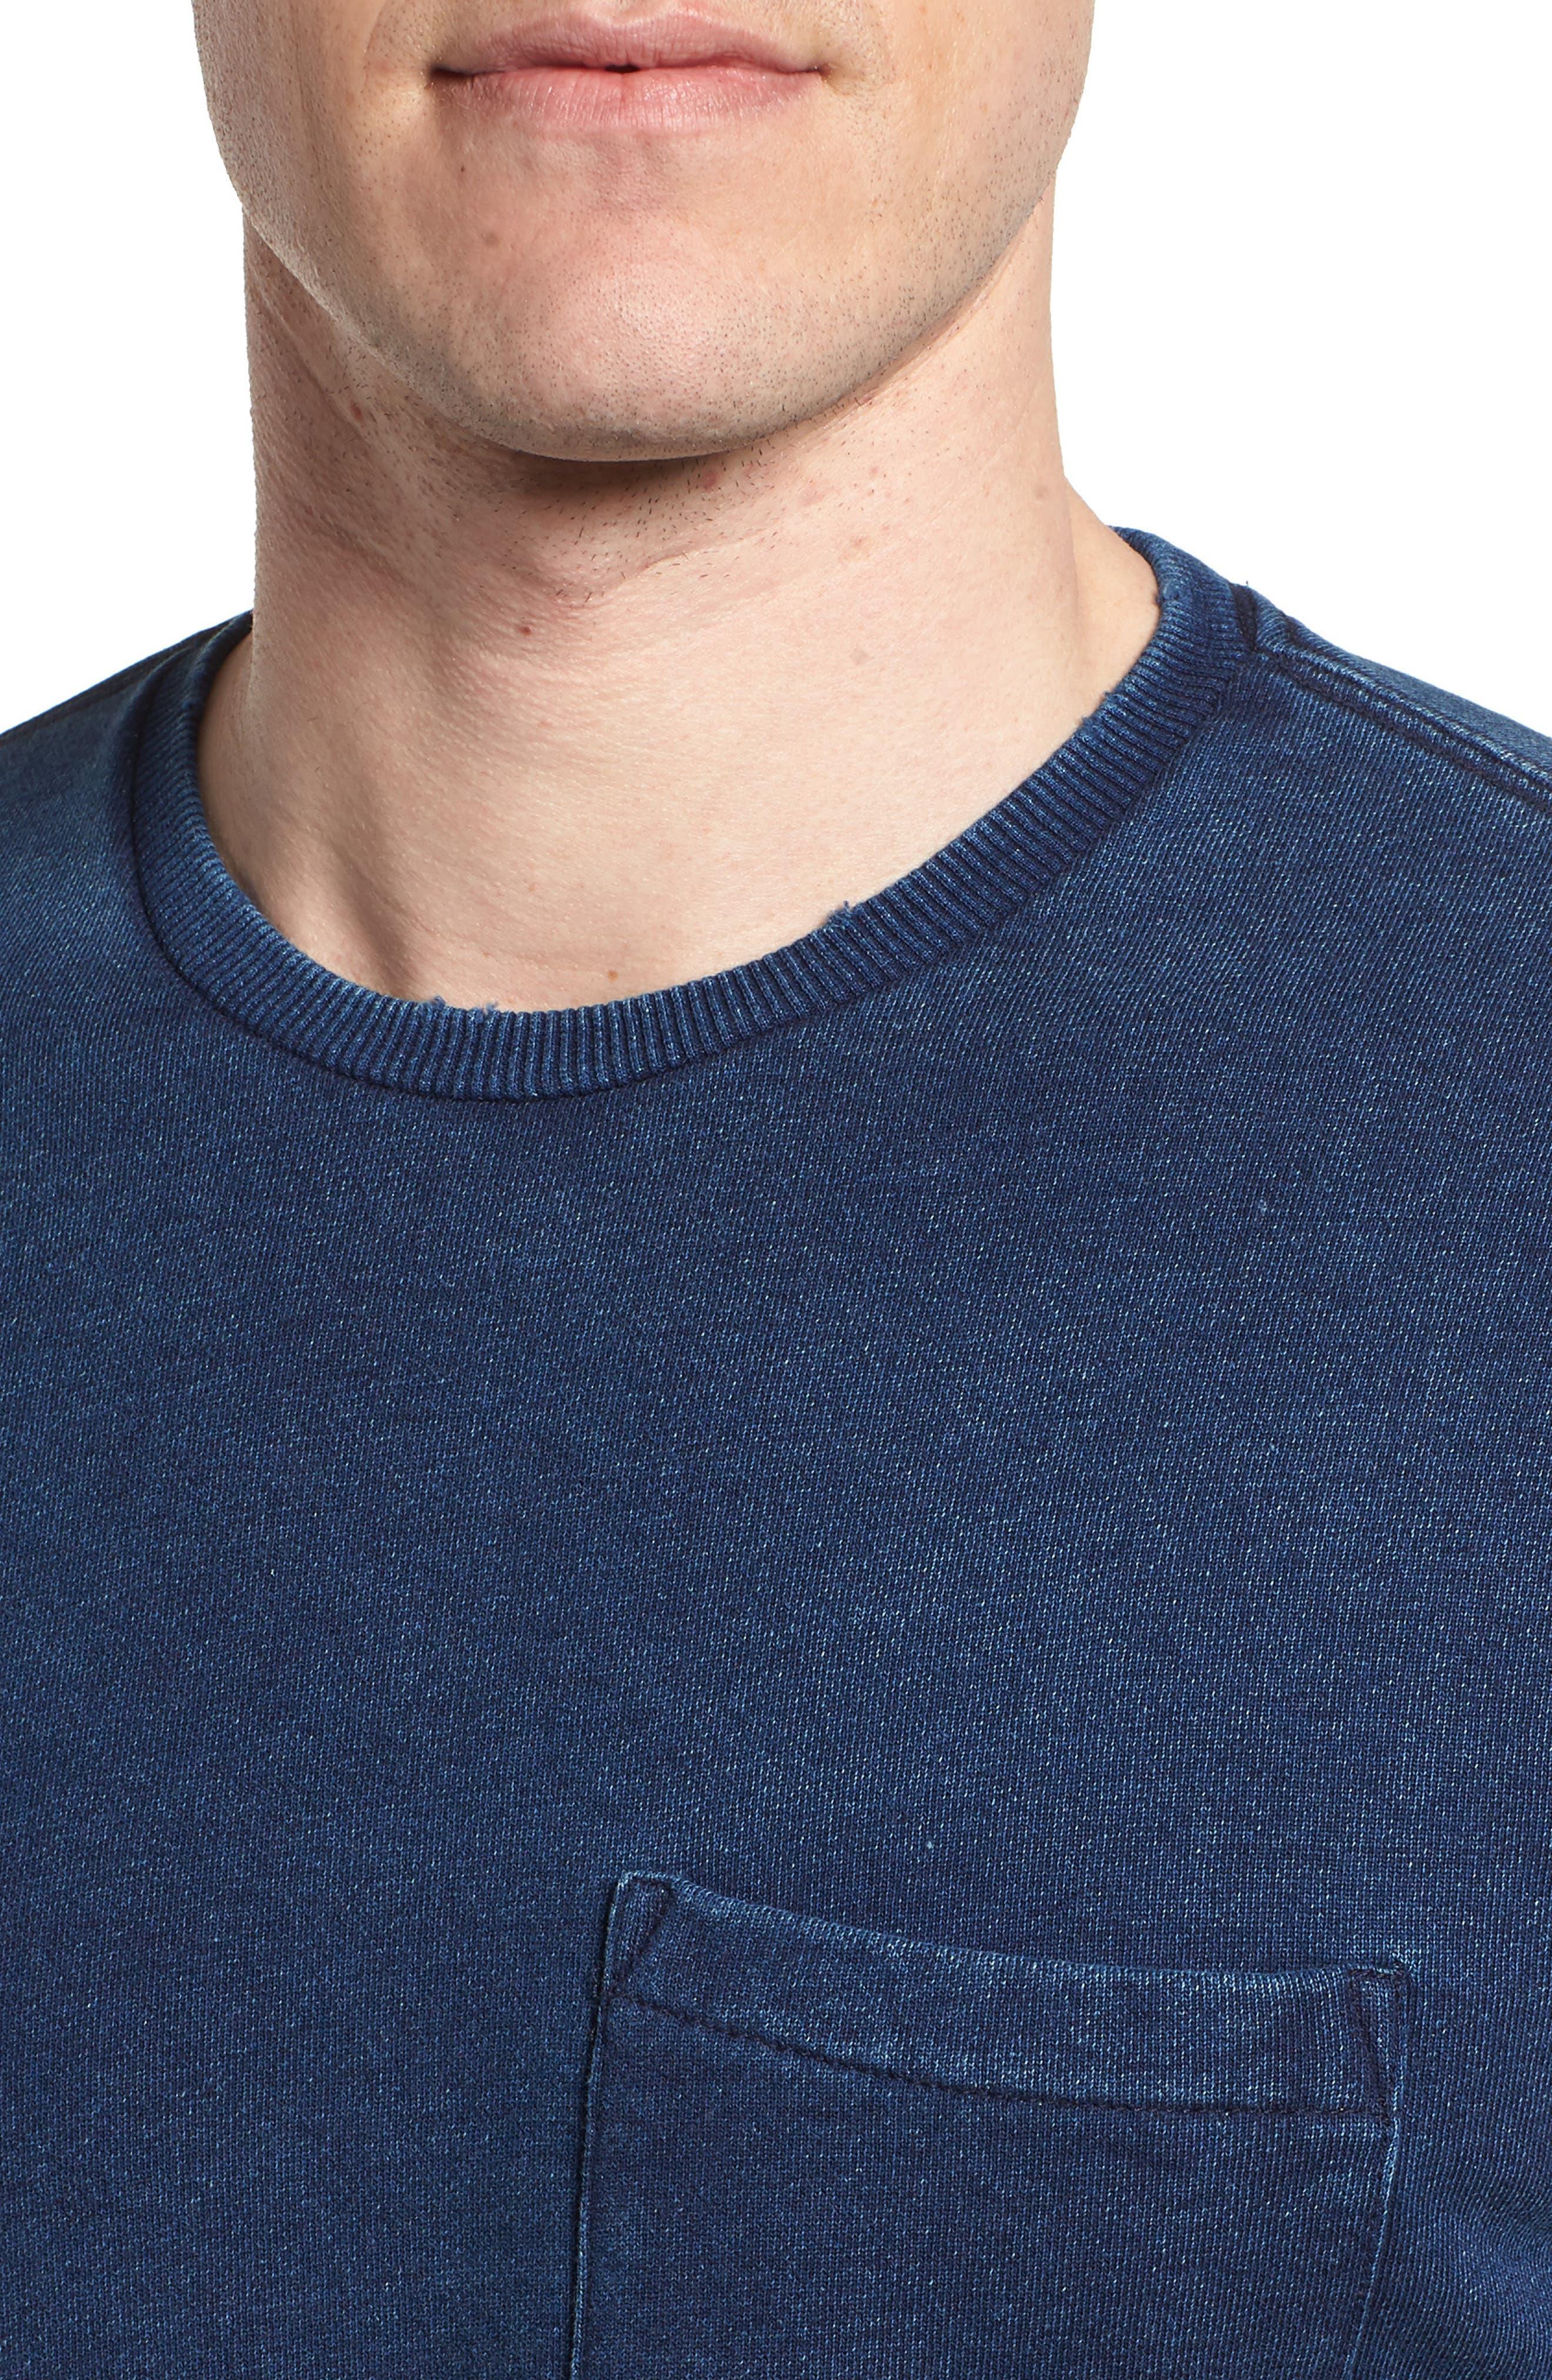 Byron Crewneck Cotton Pocket Sweatshirt,                             Alternate thumbnail 4, color,                             Harbor